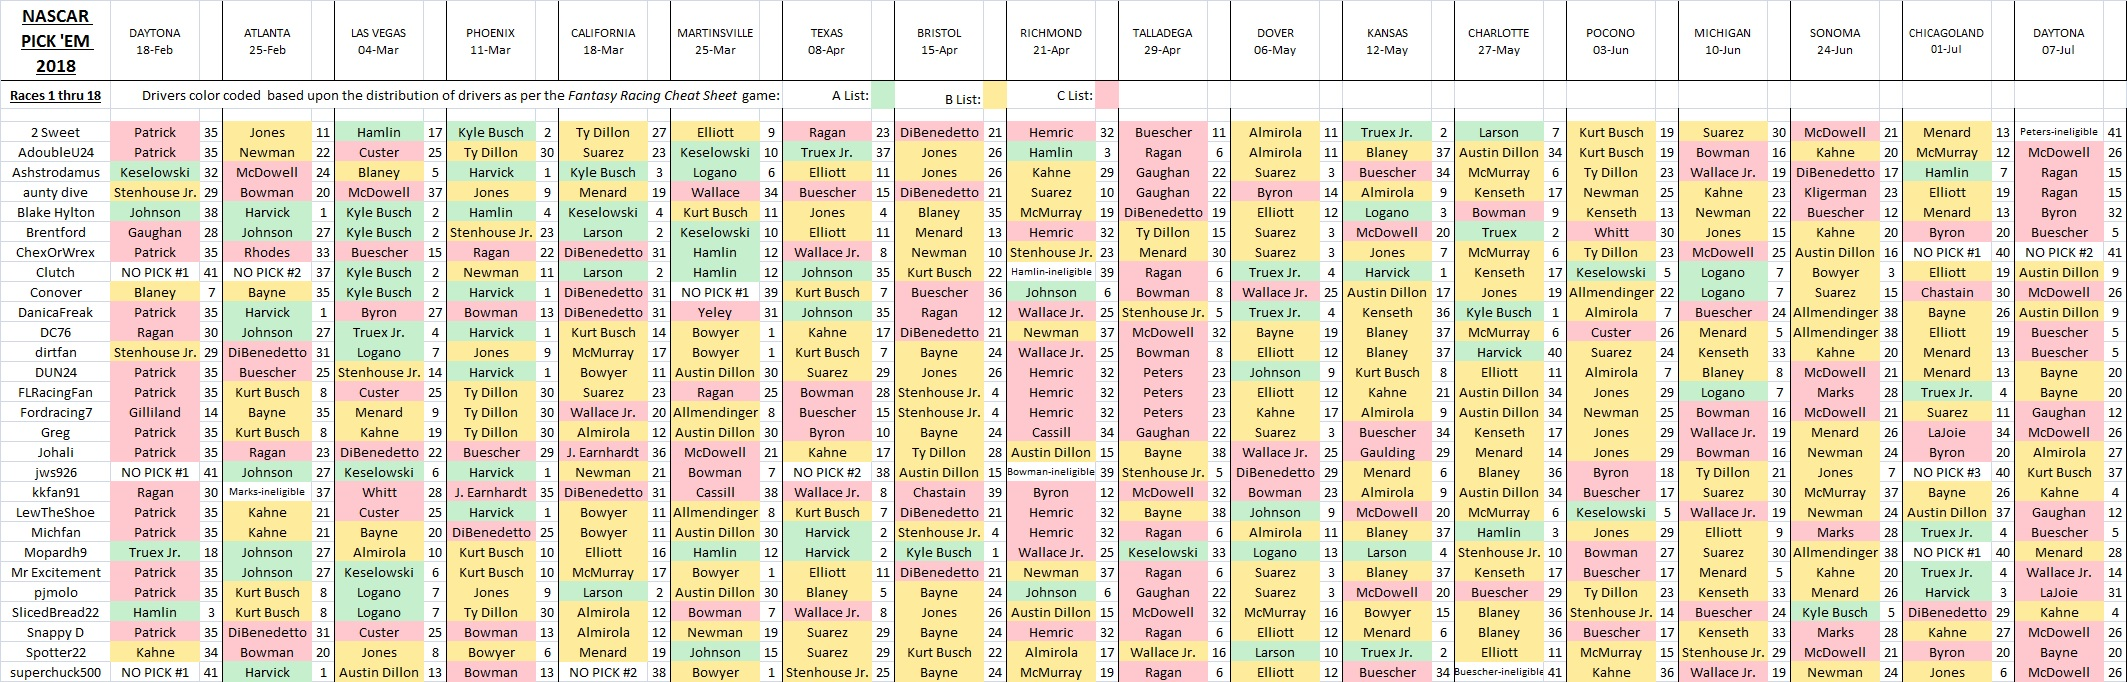 2018 Pick 'Em picks spreadsheet - 1 thru 18.jpg